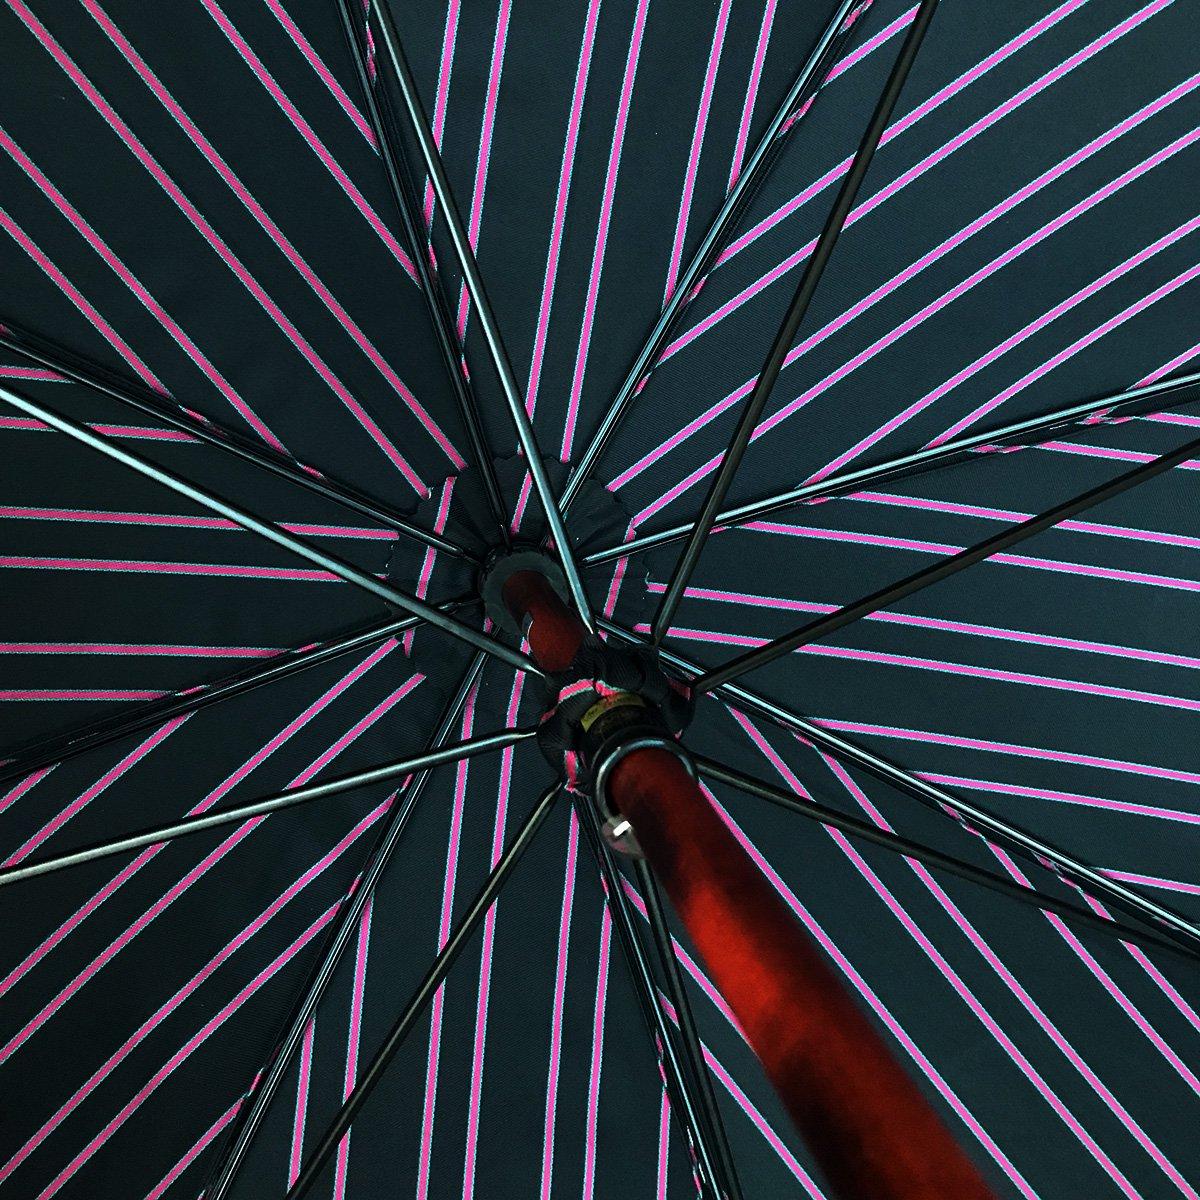 Wフェイス ストライプ 折りたたみ傘 詳細画像10